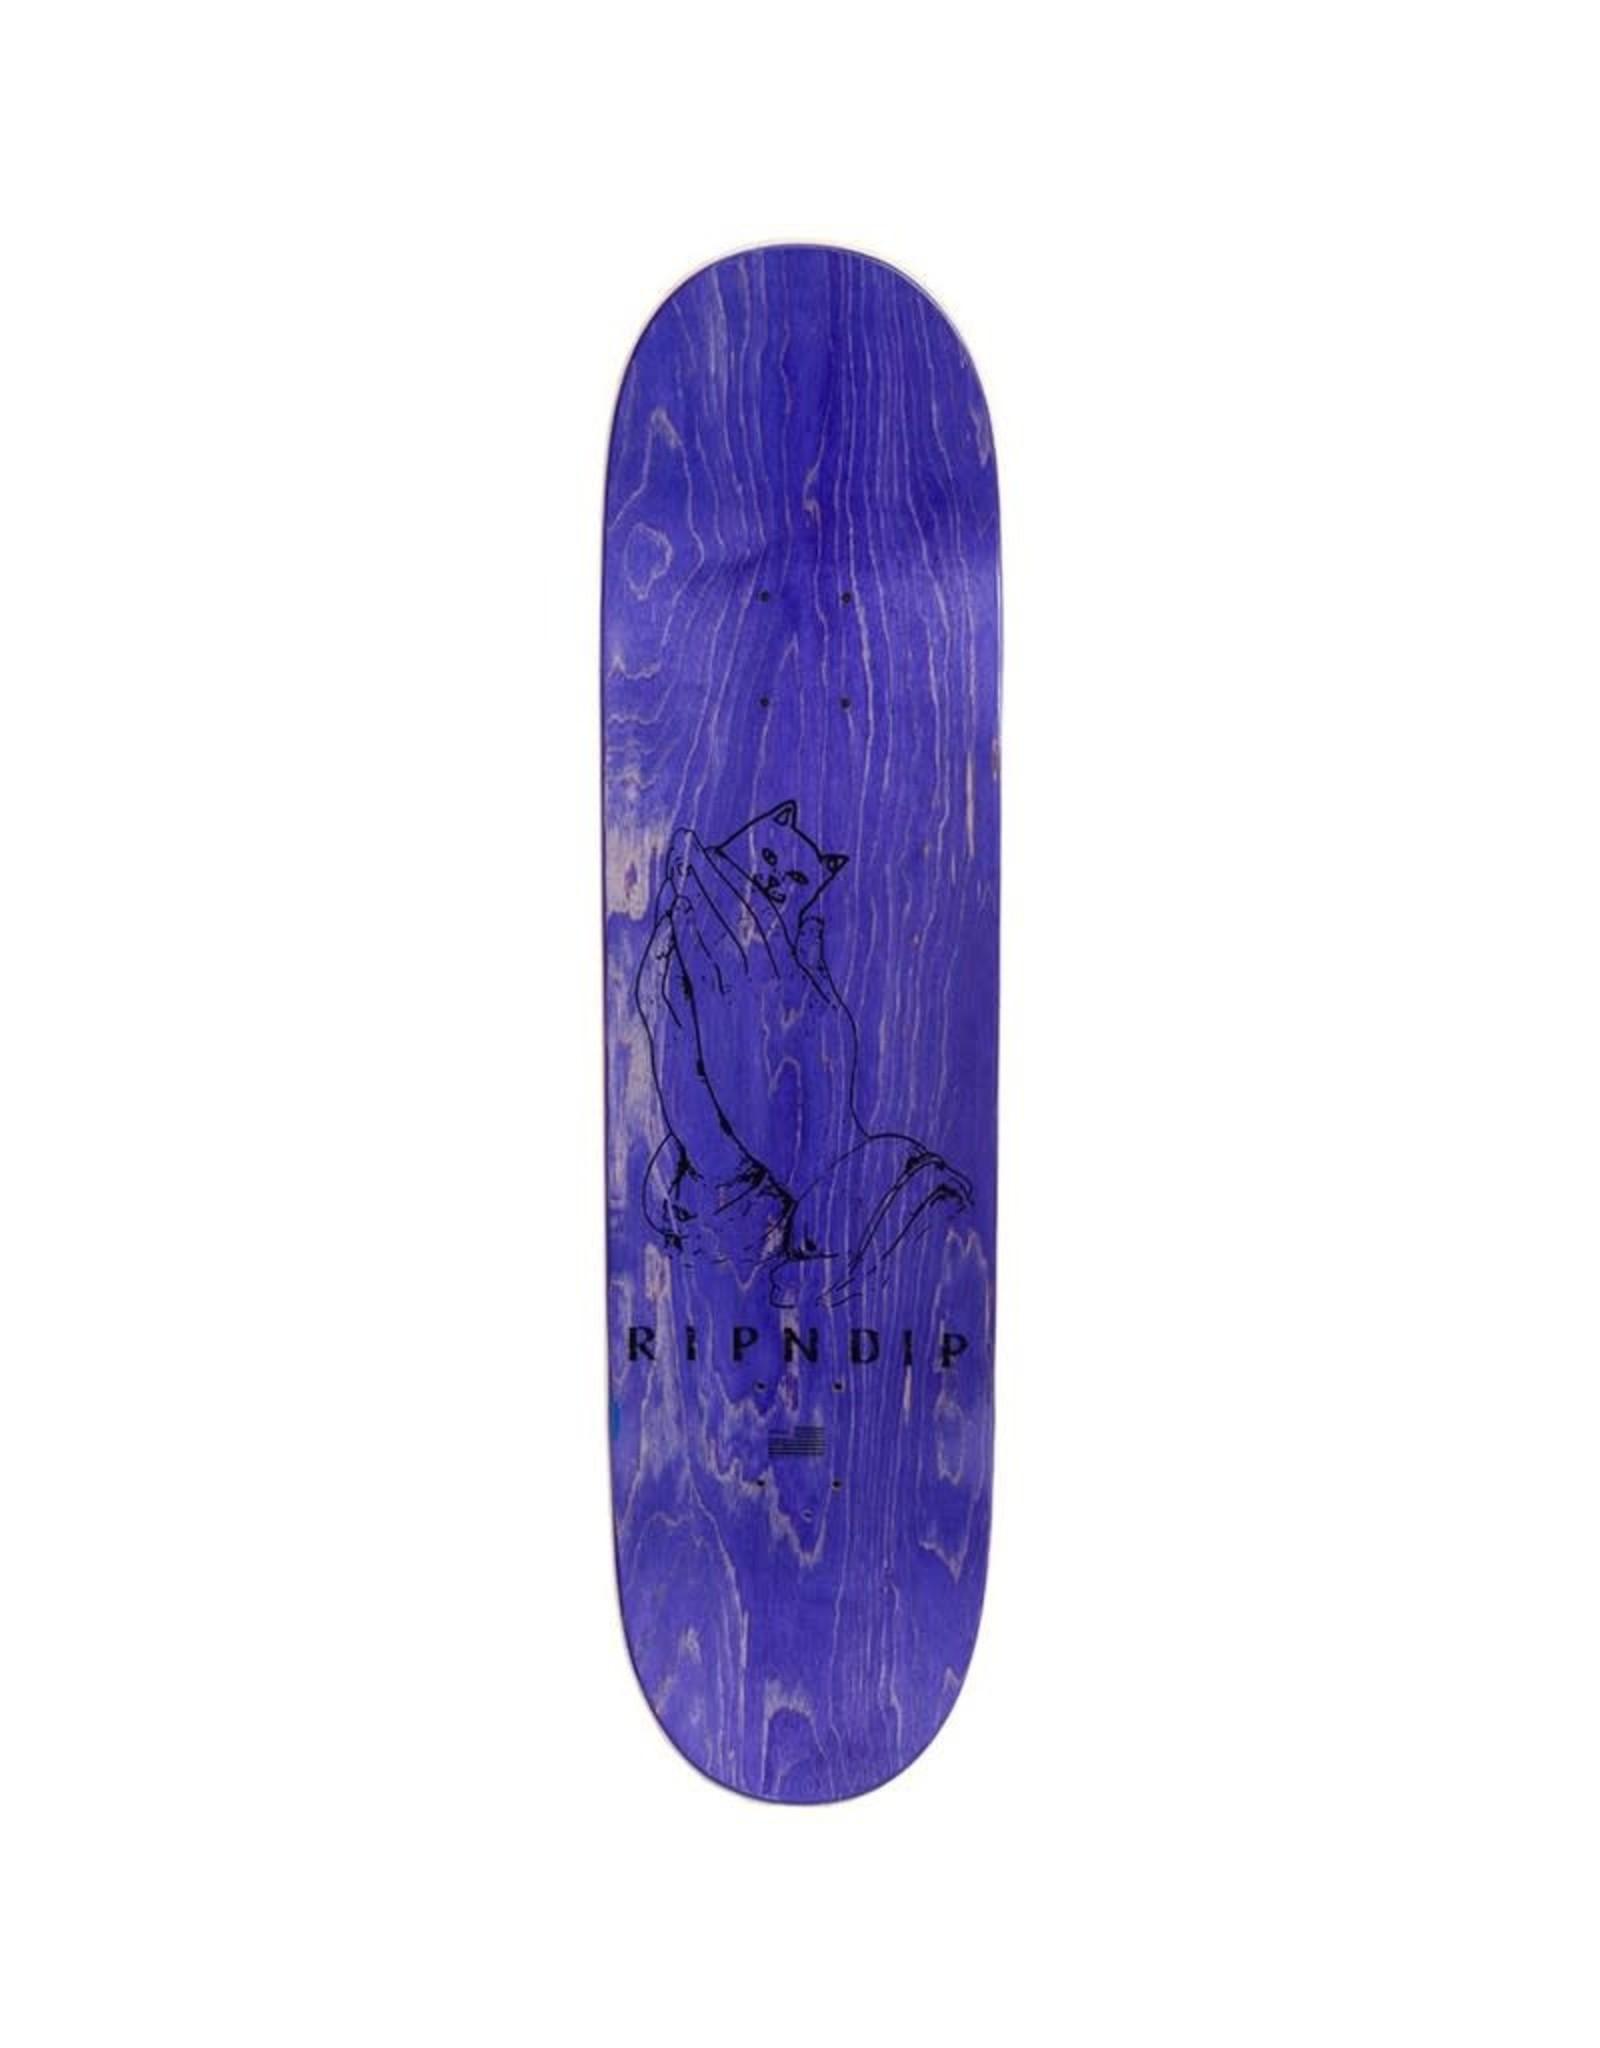 RIPNDIP RIPNDIP 8.0 Lord Nermal Skateboard Deck Orange